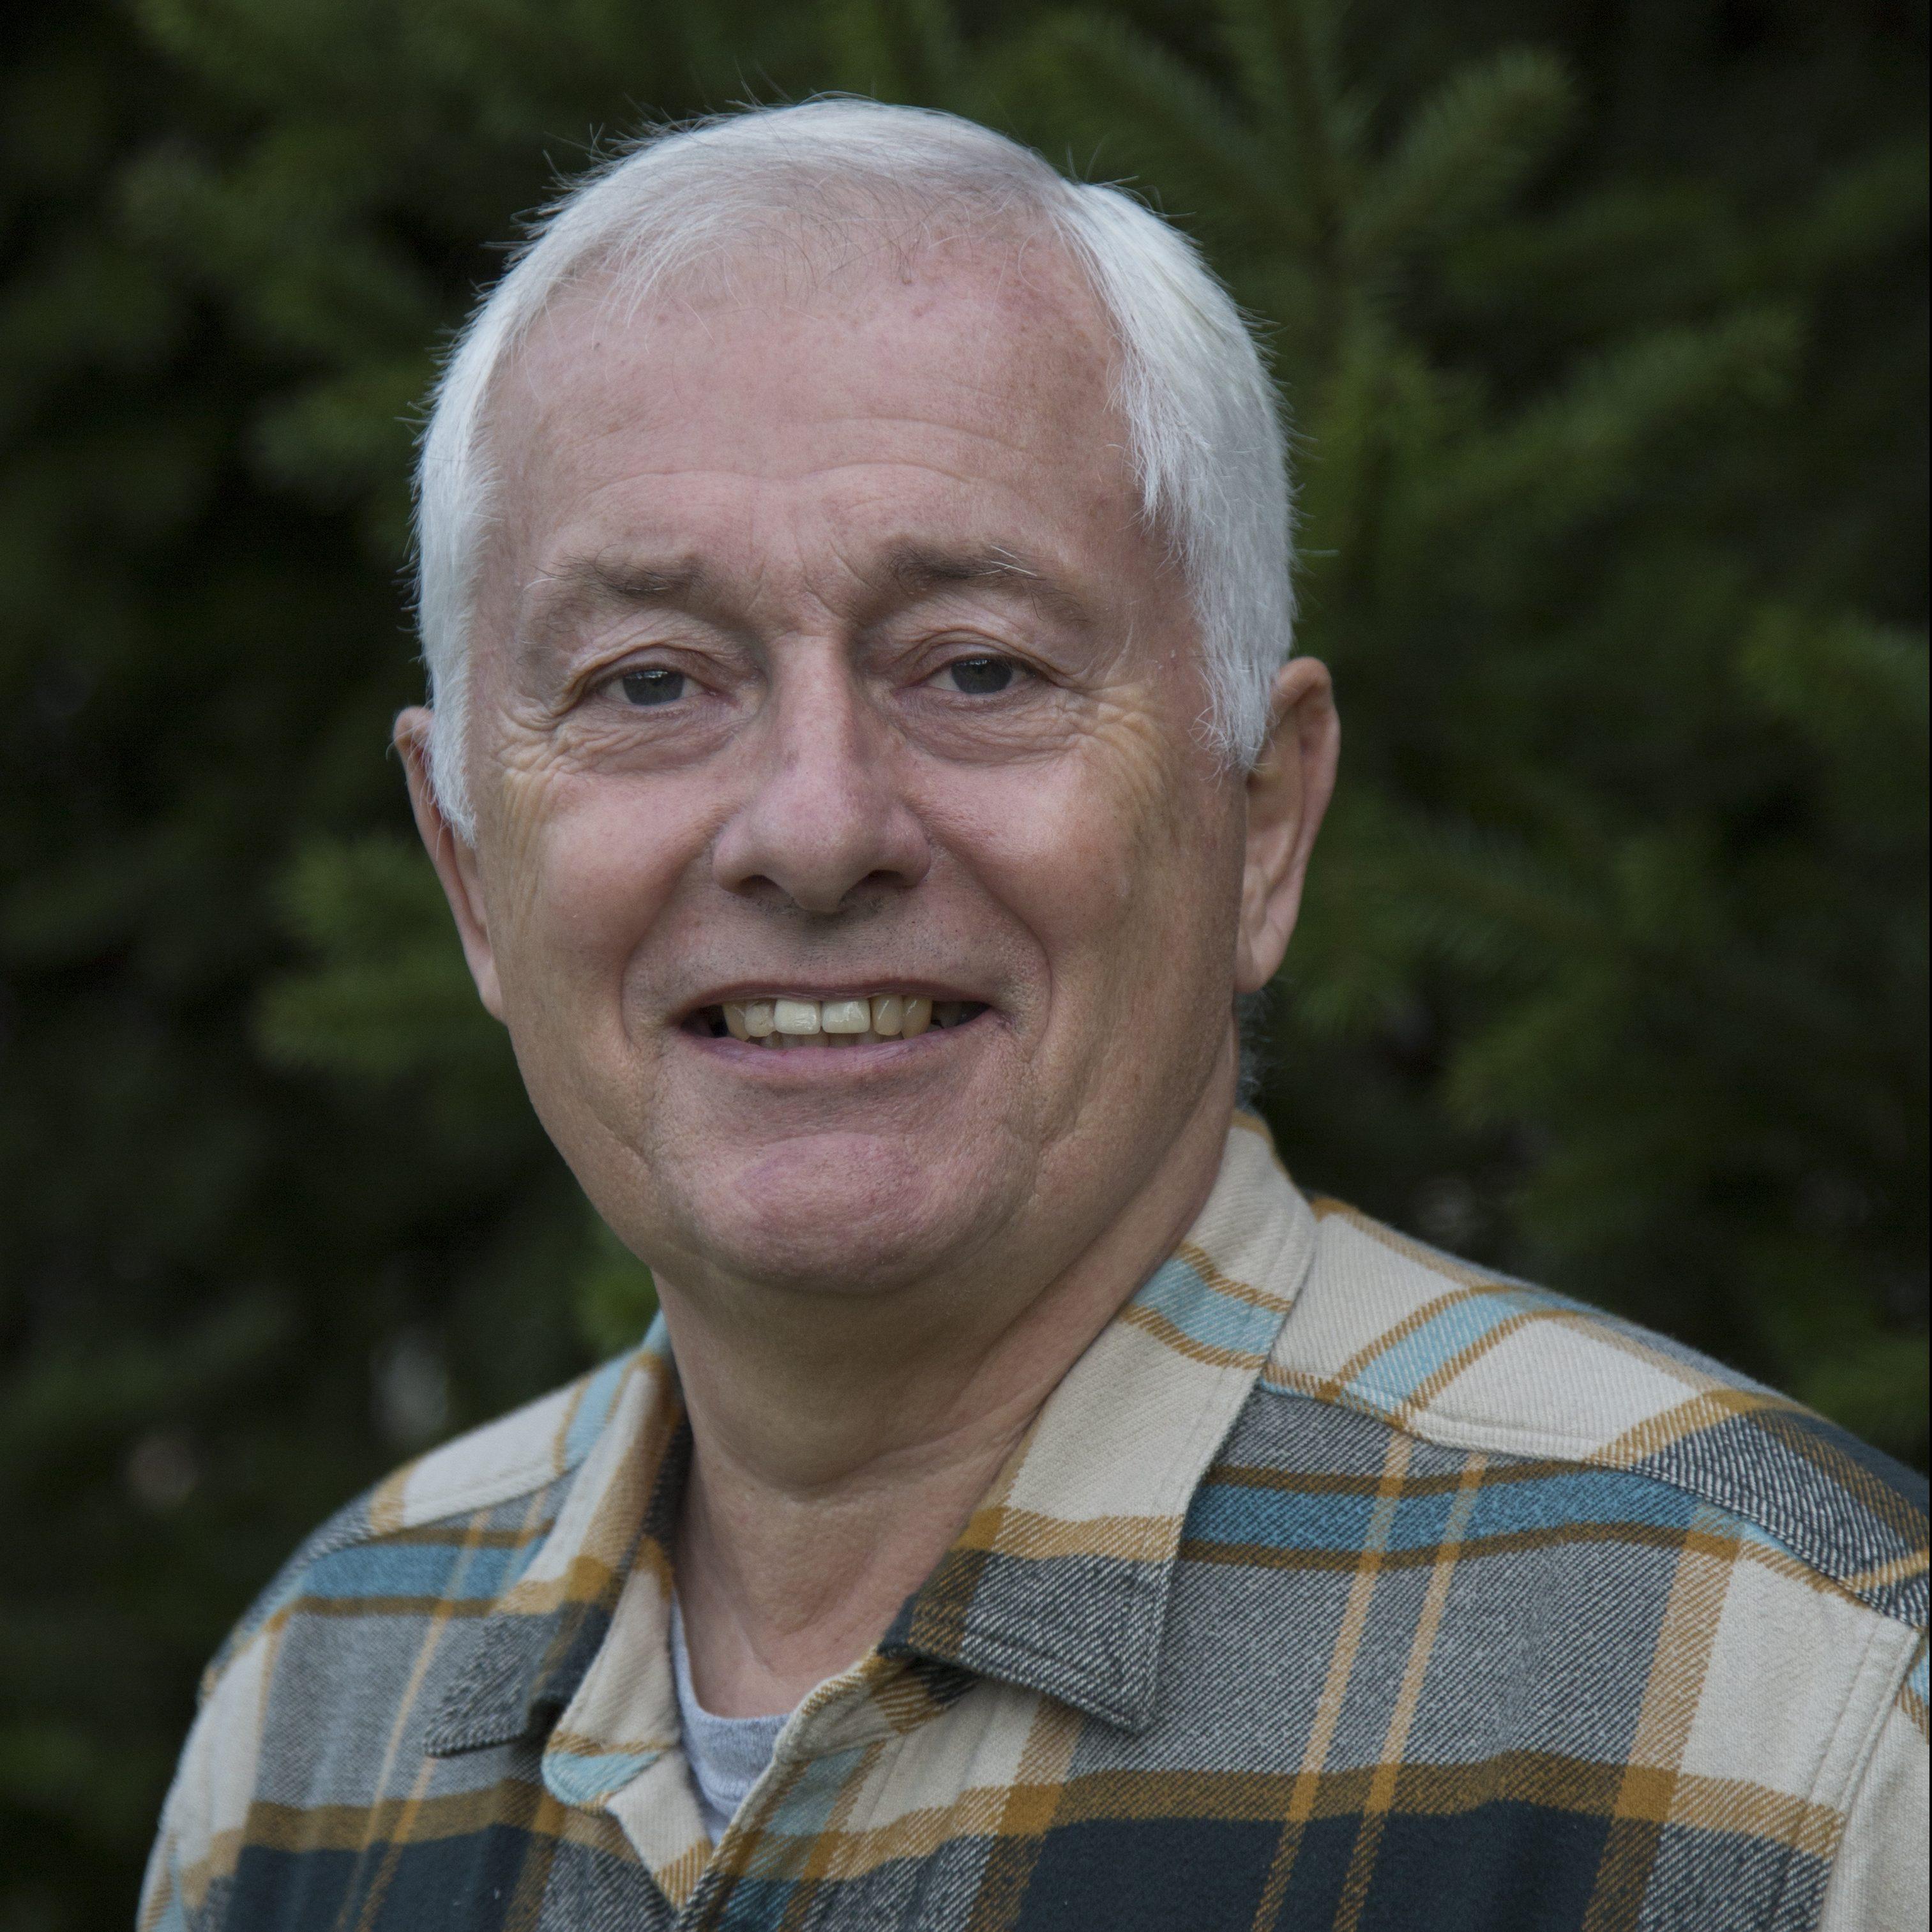 Jeff Sayer